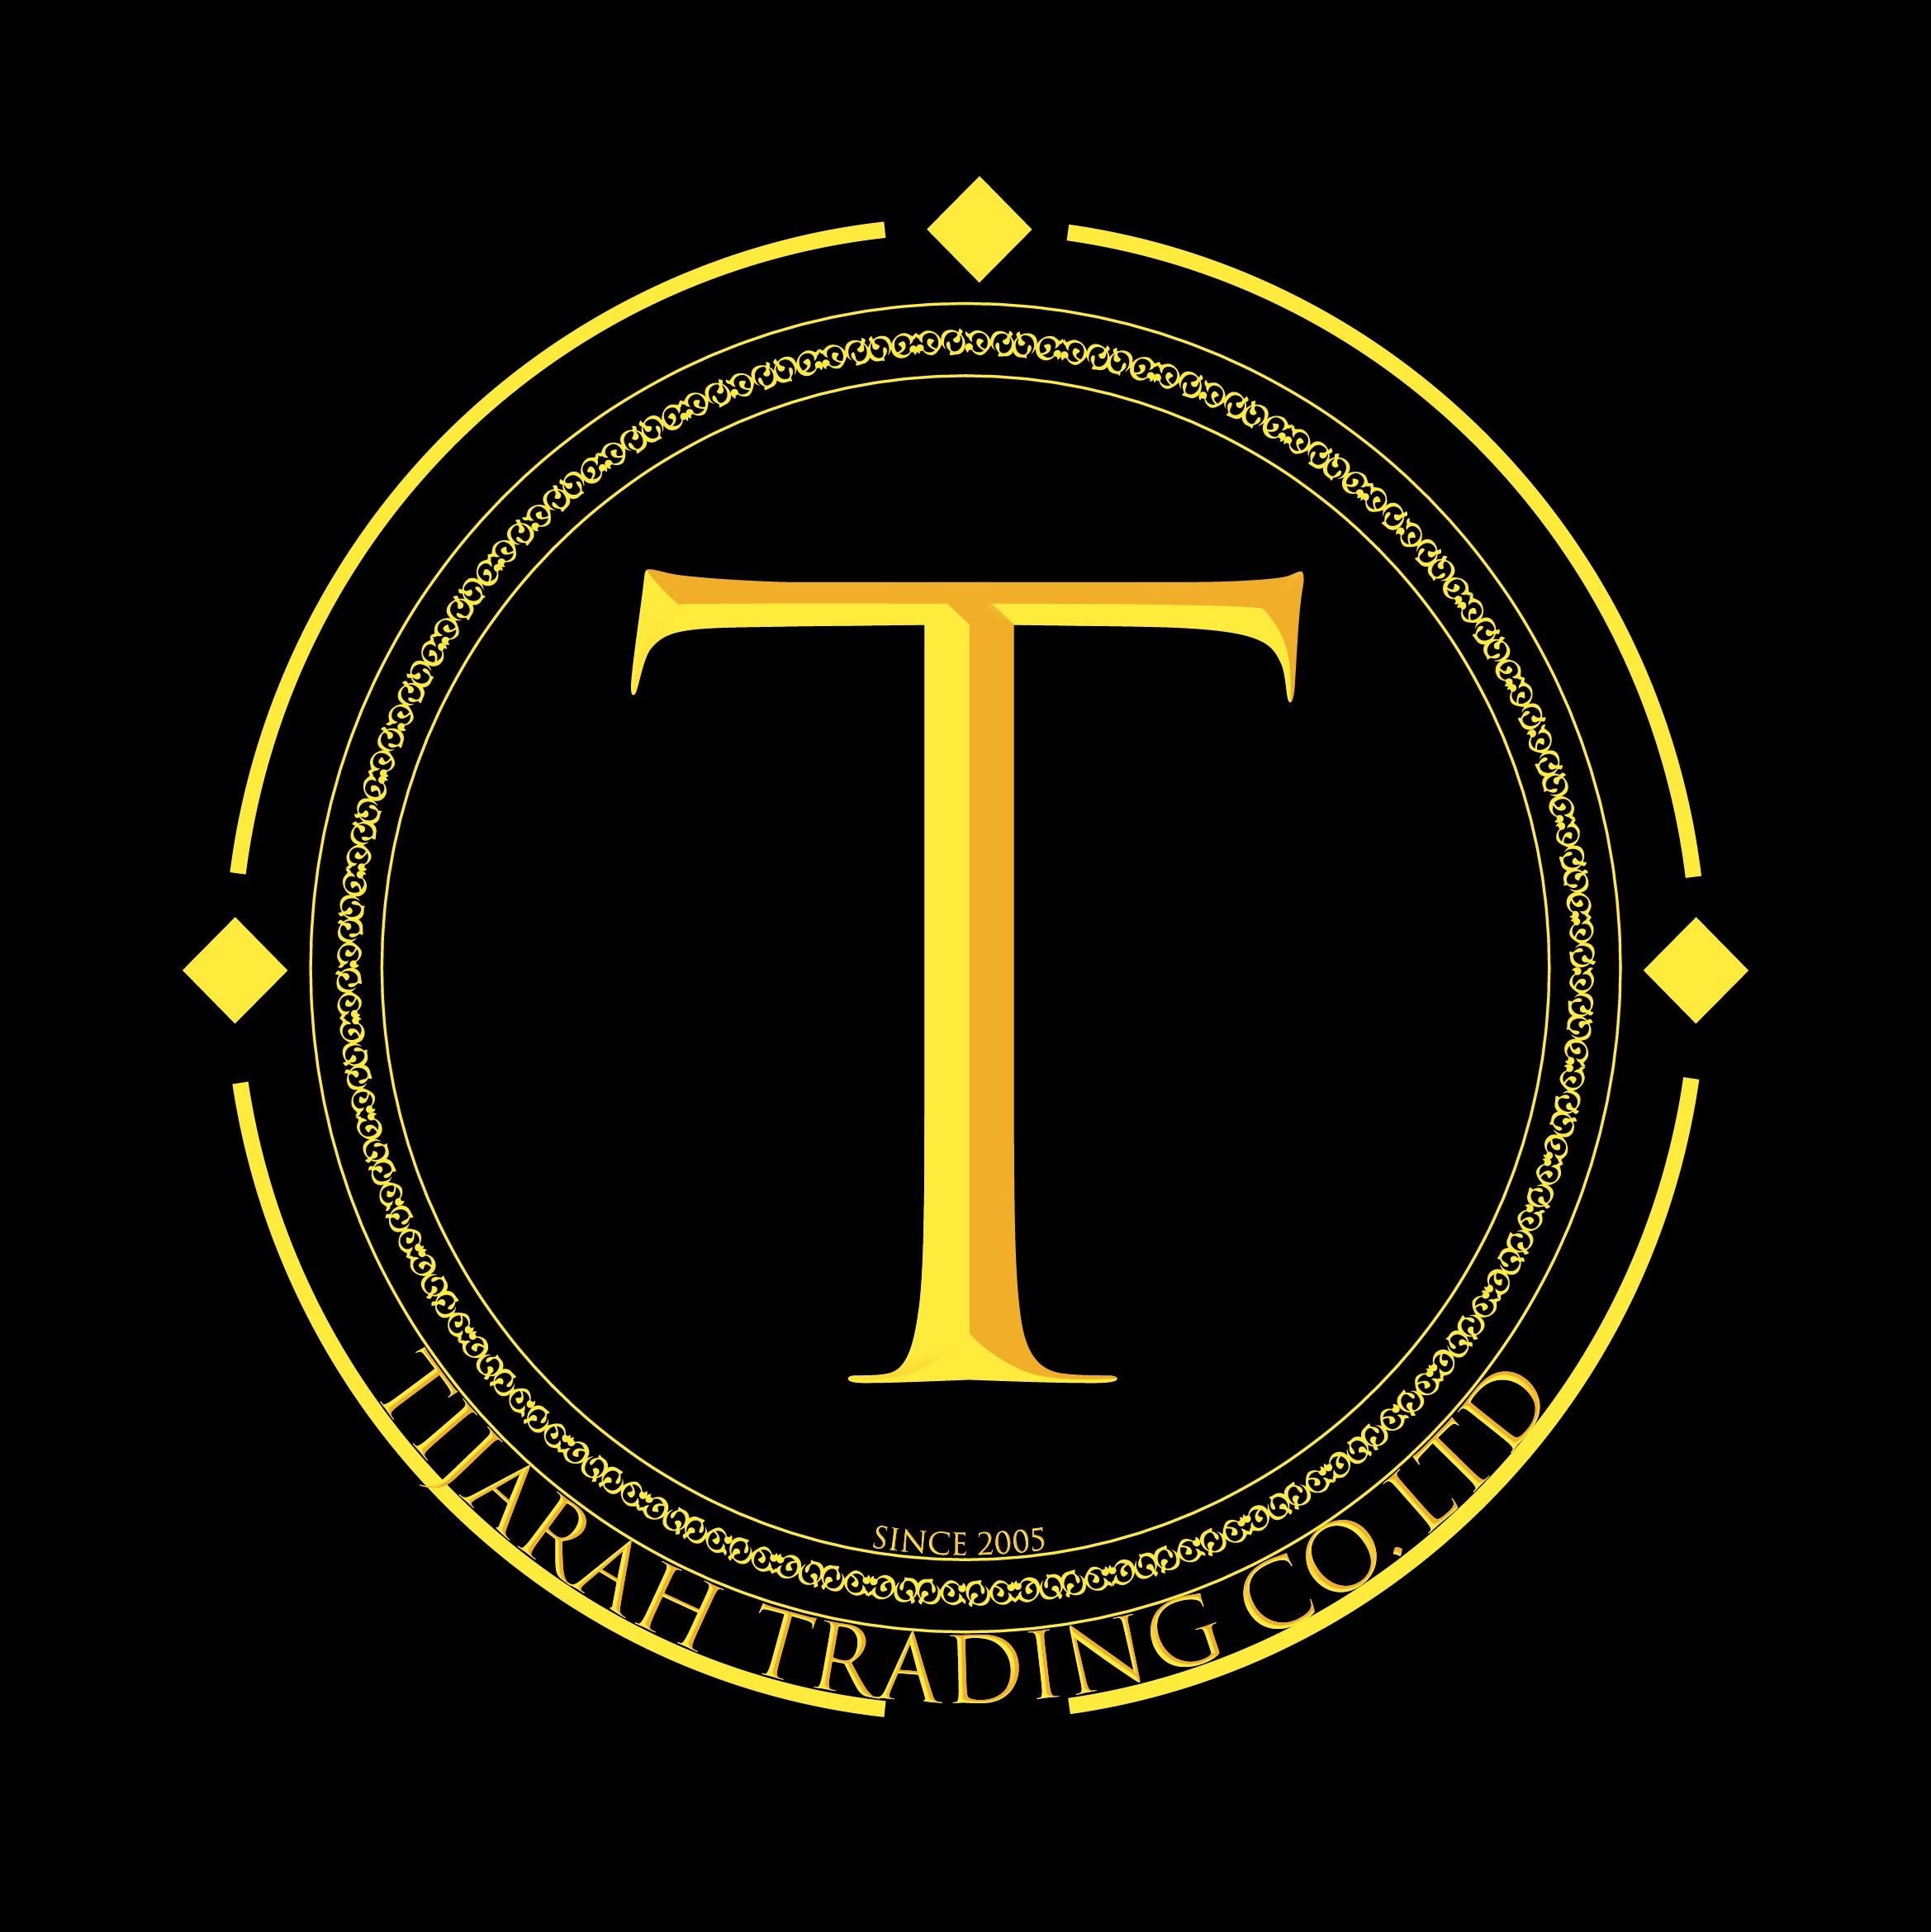 Tijarah Trading Co. Ltd